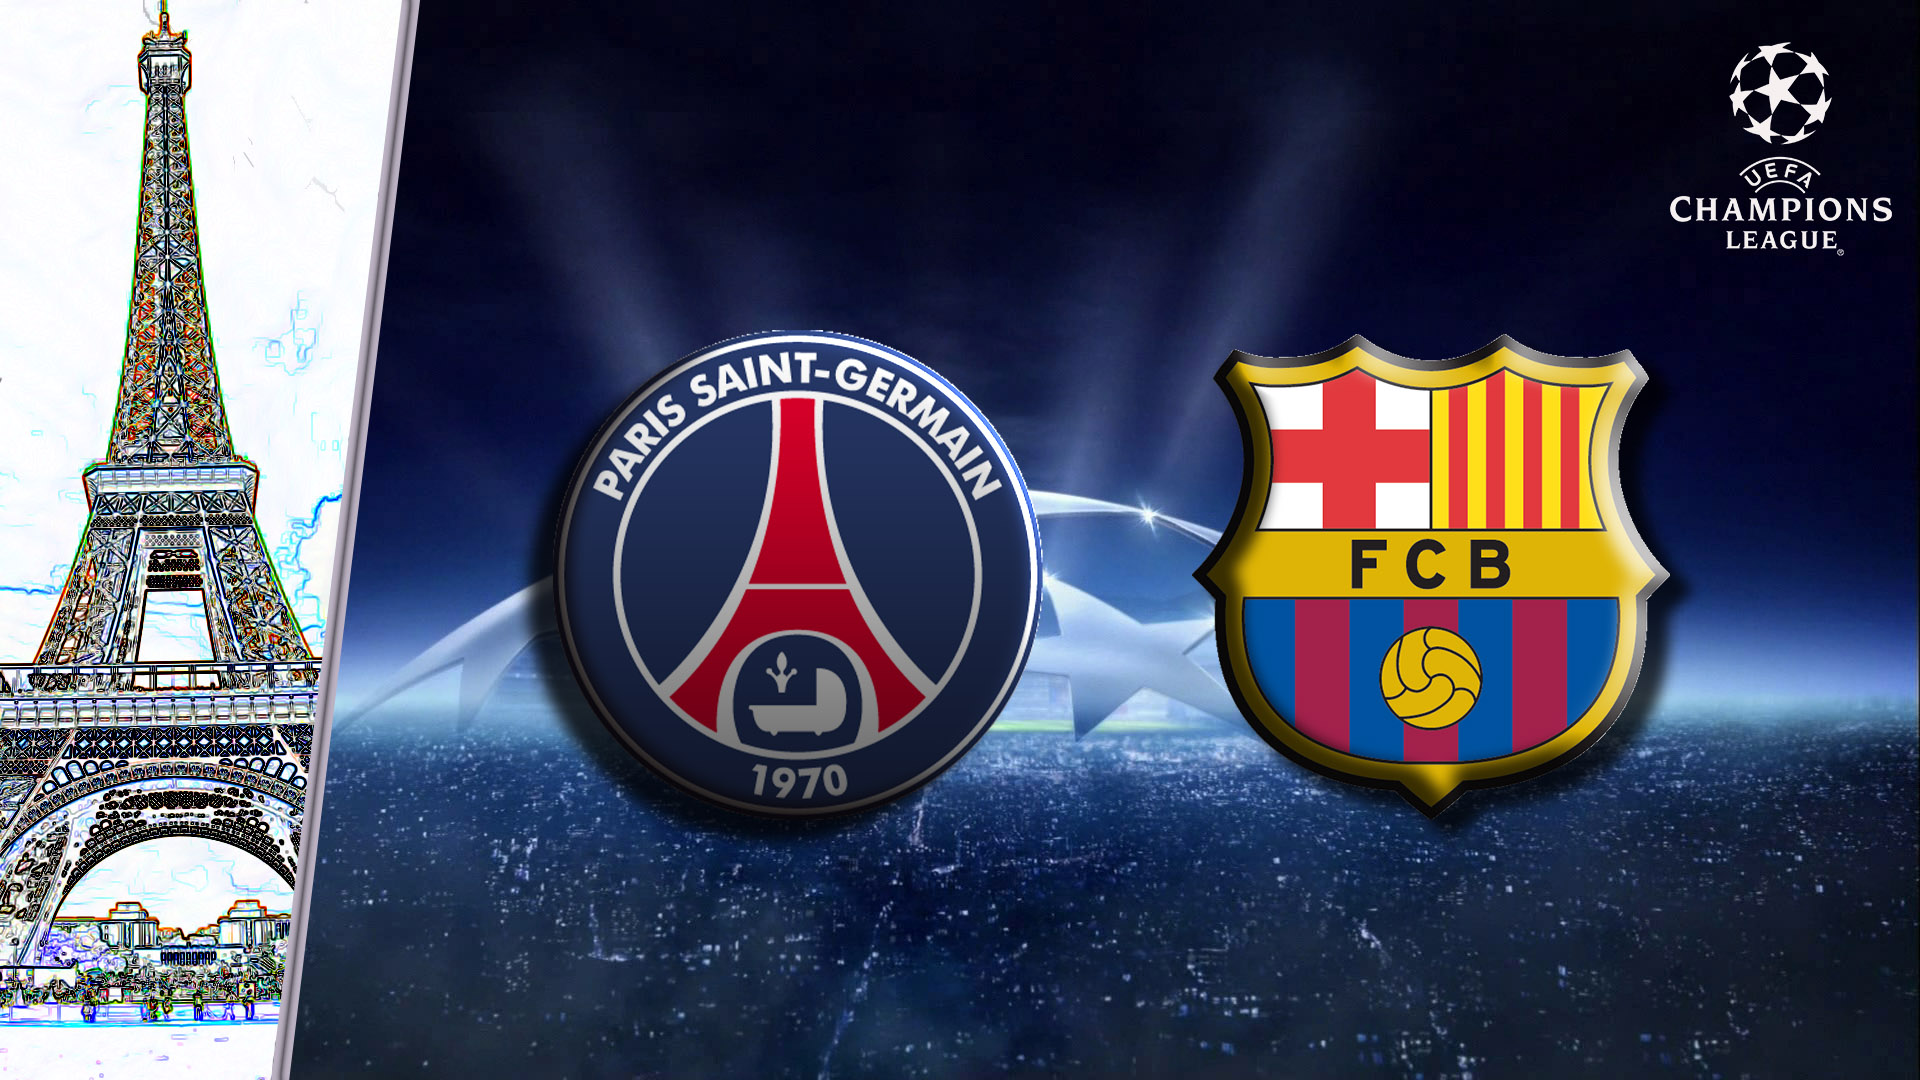 Прогноз на матч ПСЖ - Барселона 14 февраля 2017